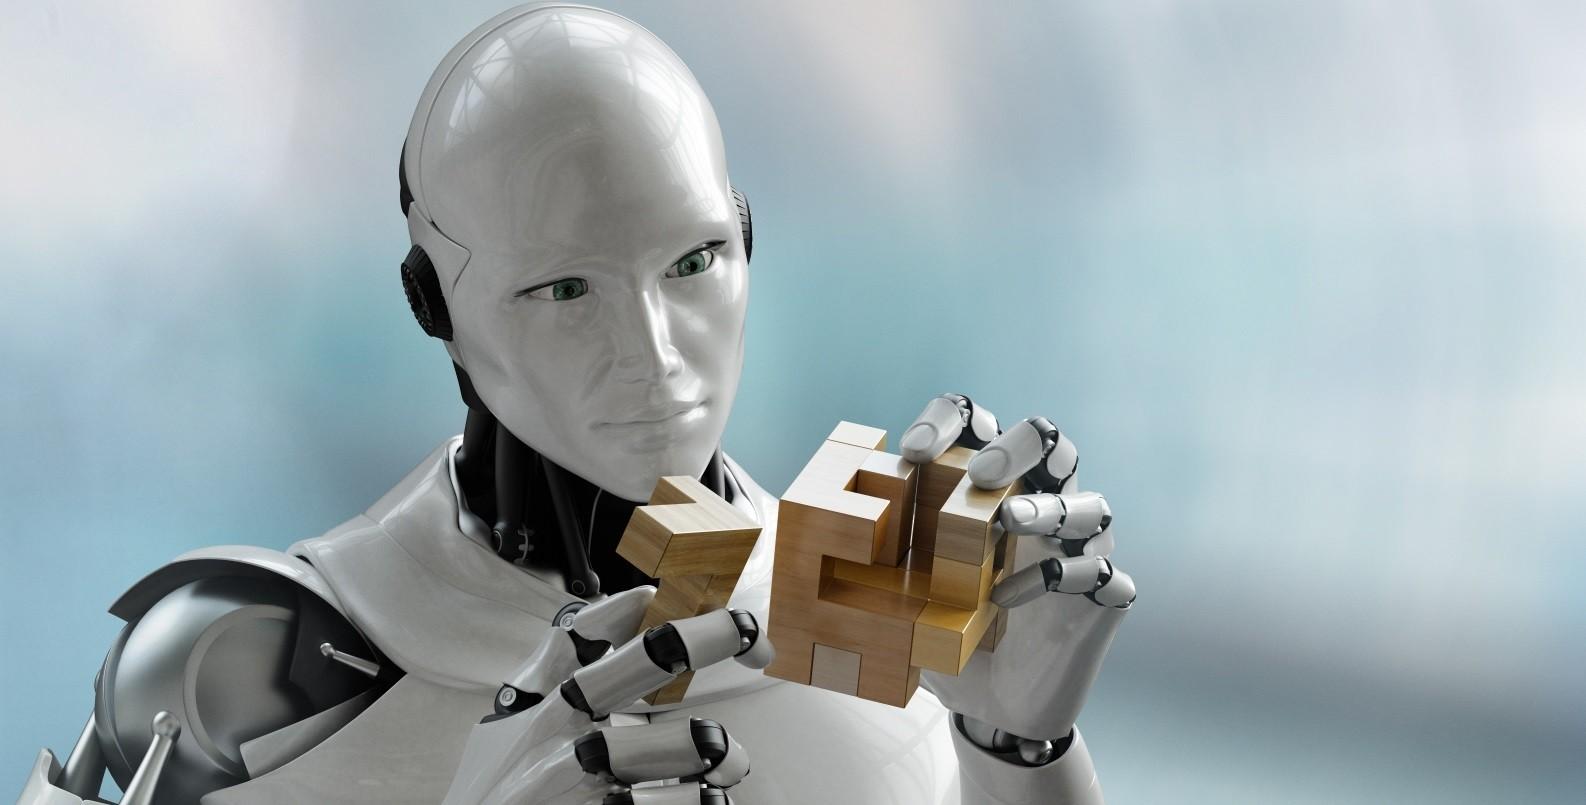 робот гуманоид